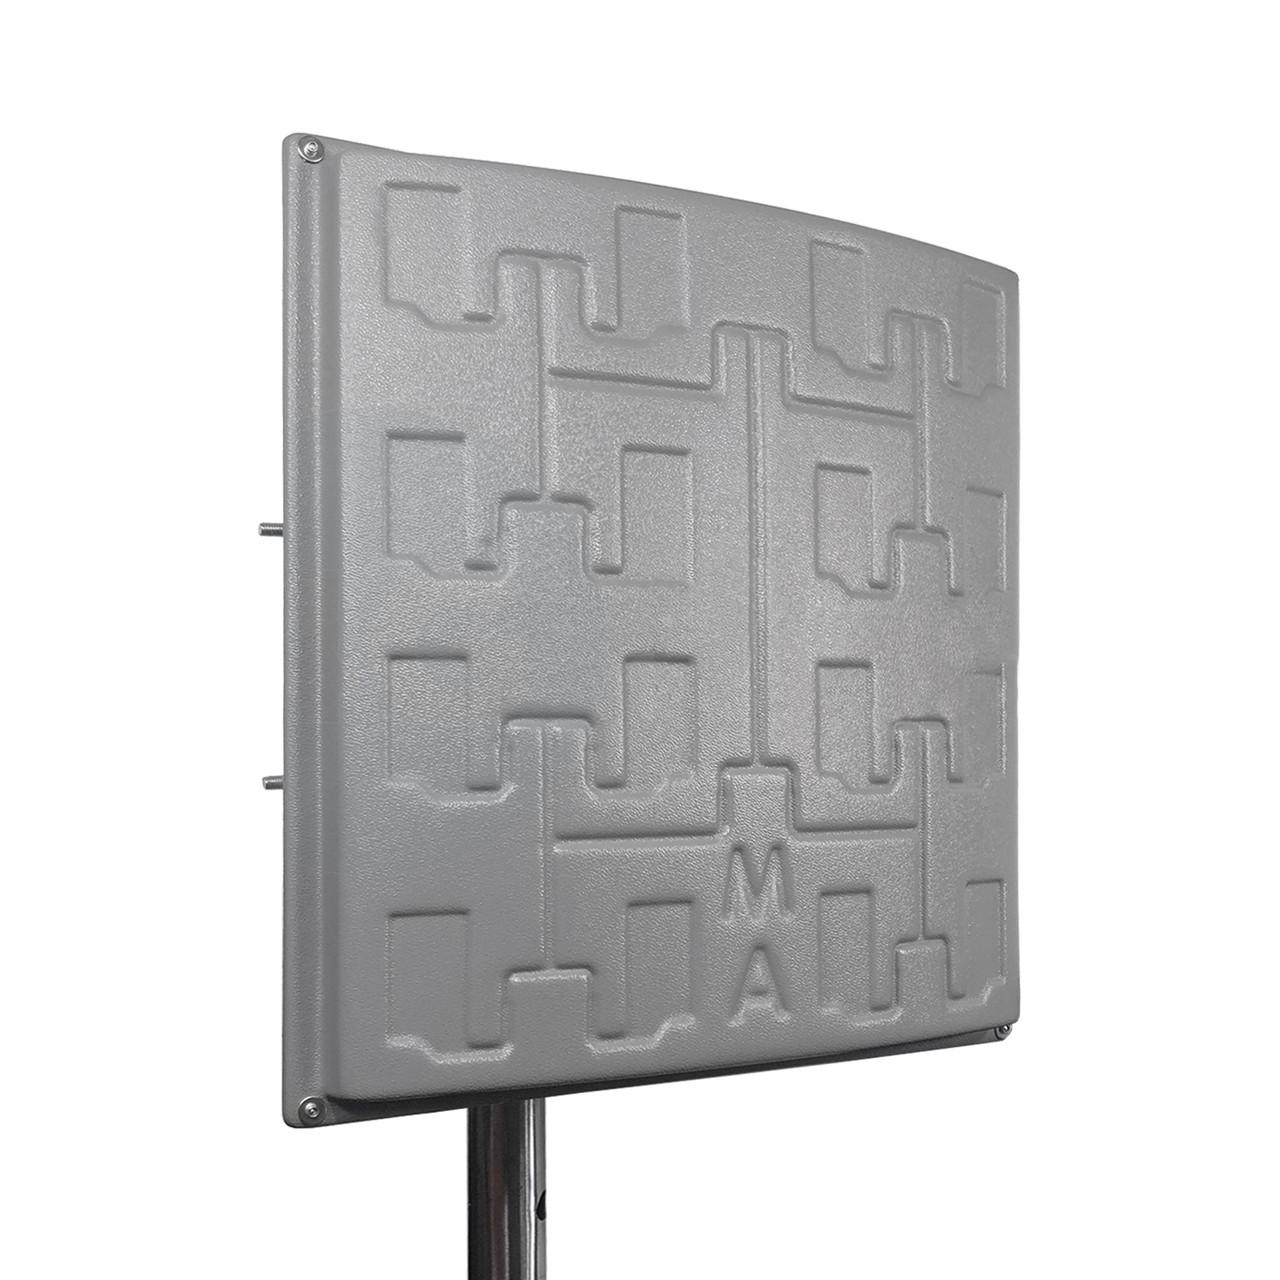 Антенна 3G/4G LTE MIMO 2 x 17 dBi Сарма+